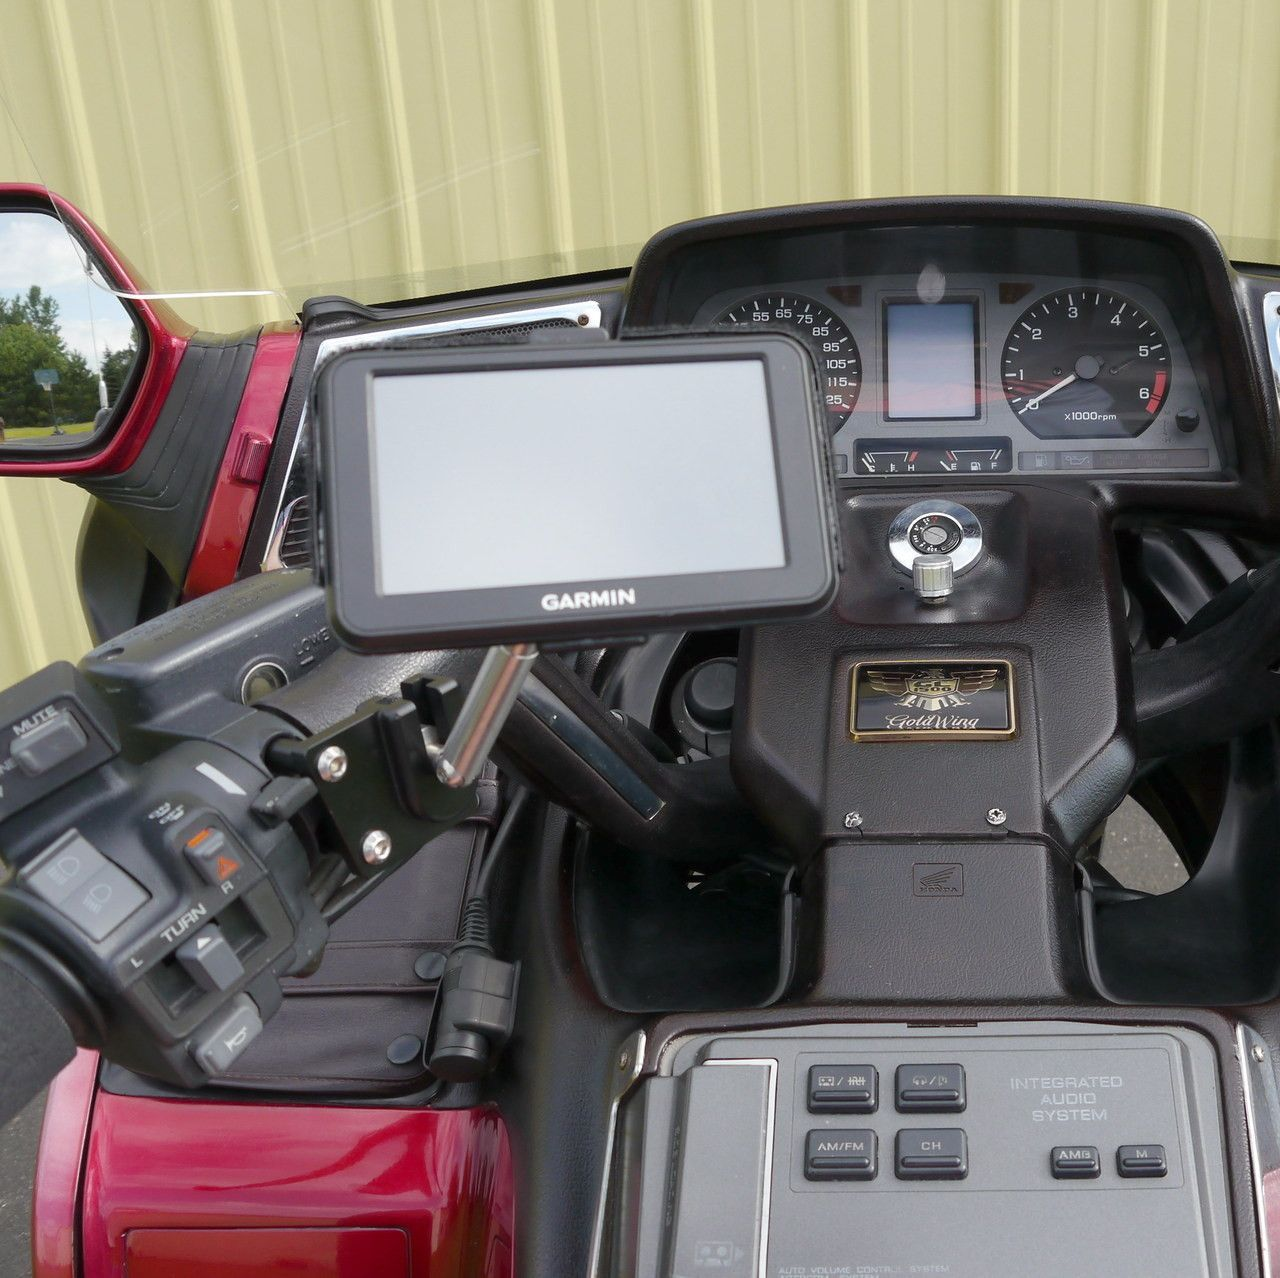 7 Way Navigation 2000 Jeep Wrangler Front Suspension Diagram Ecaddy Gps Ball Mount W Extension Goldwing Brake Clutch